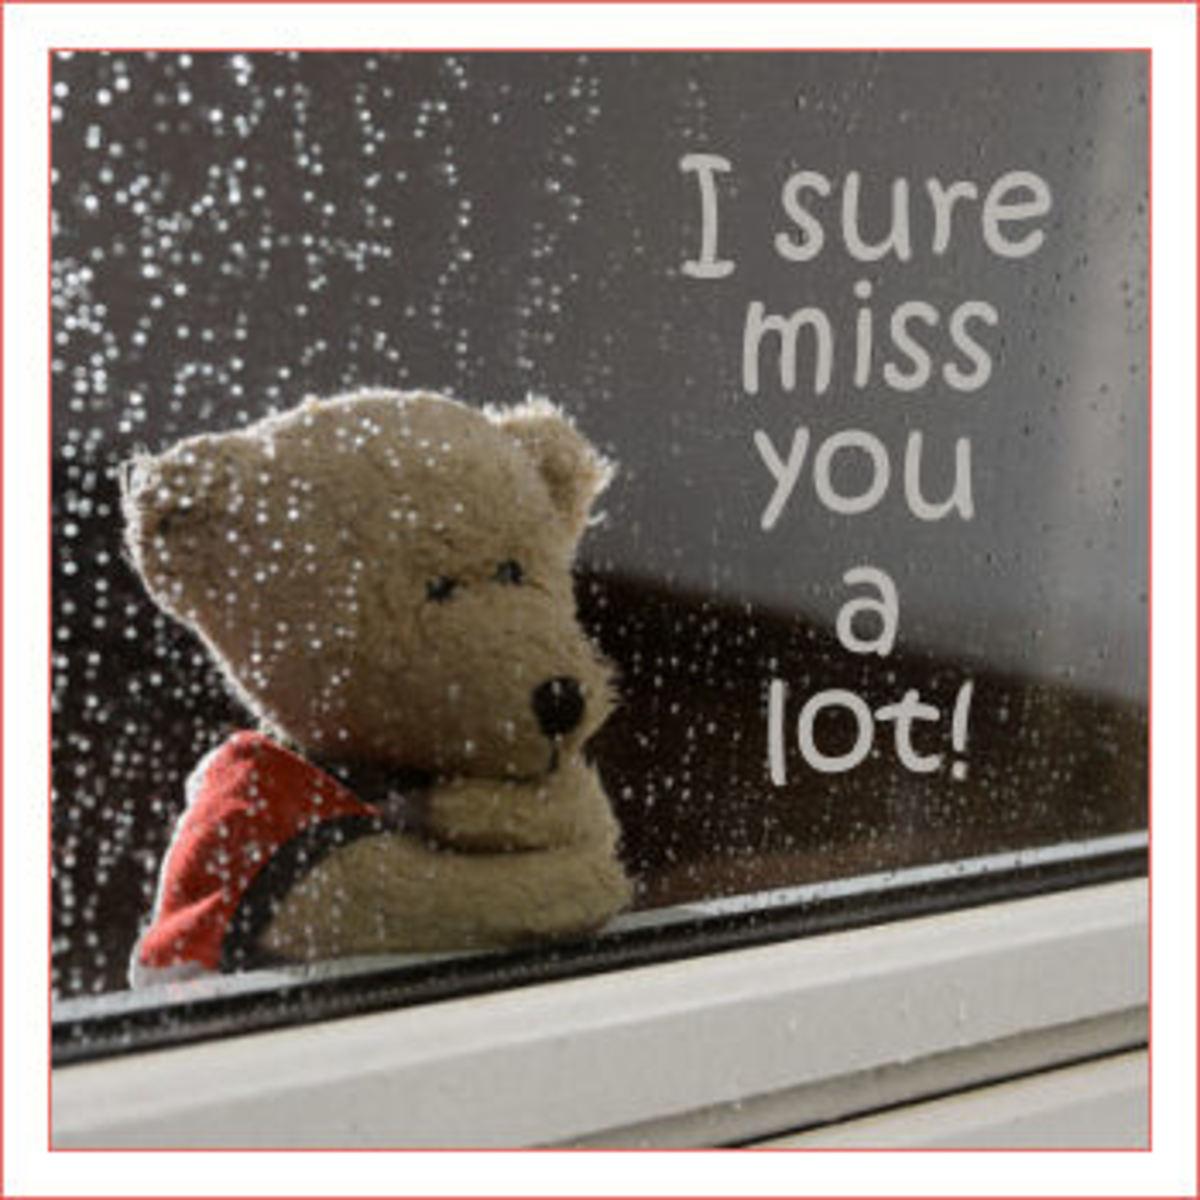 http://cards.lovingyou.com/platinum/images/missh023.jpg